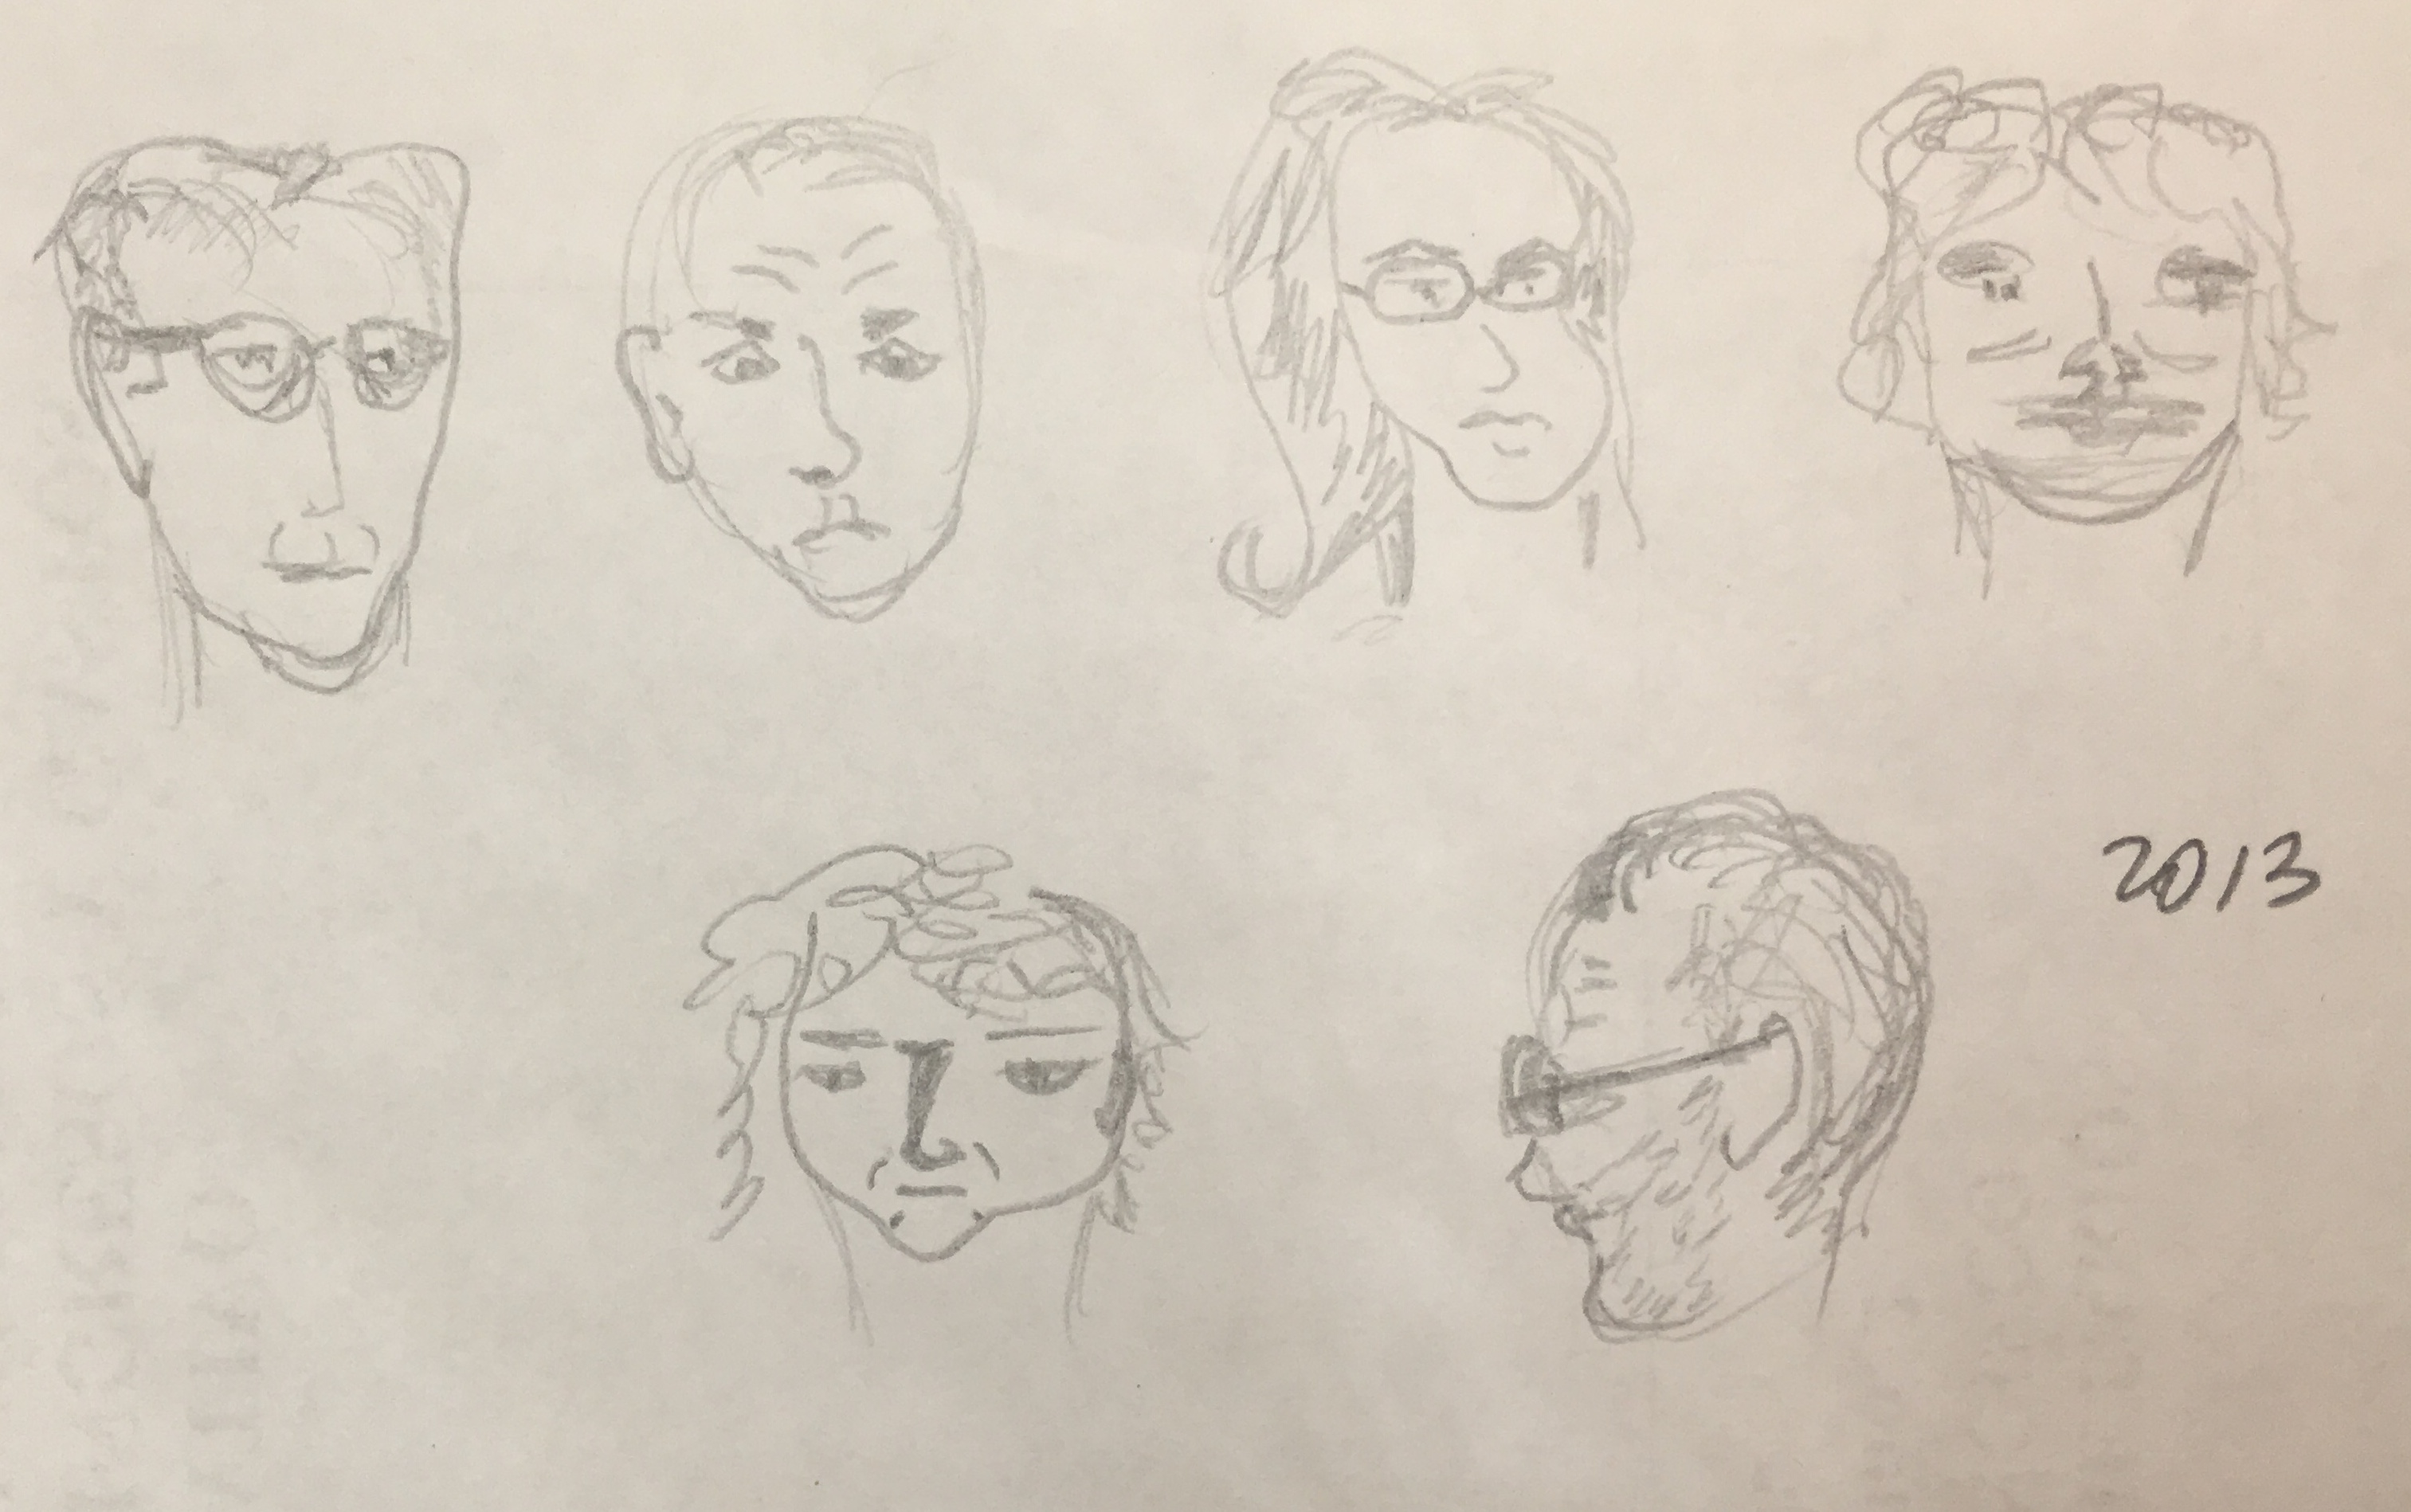 La Reunion - pencil drawings